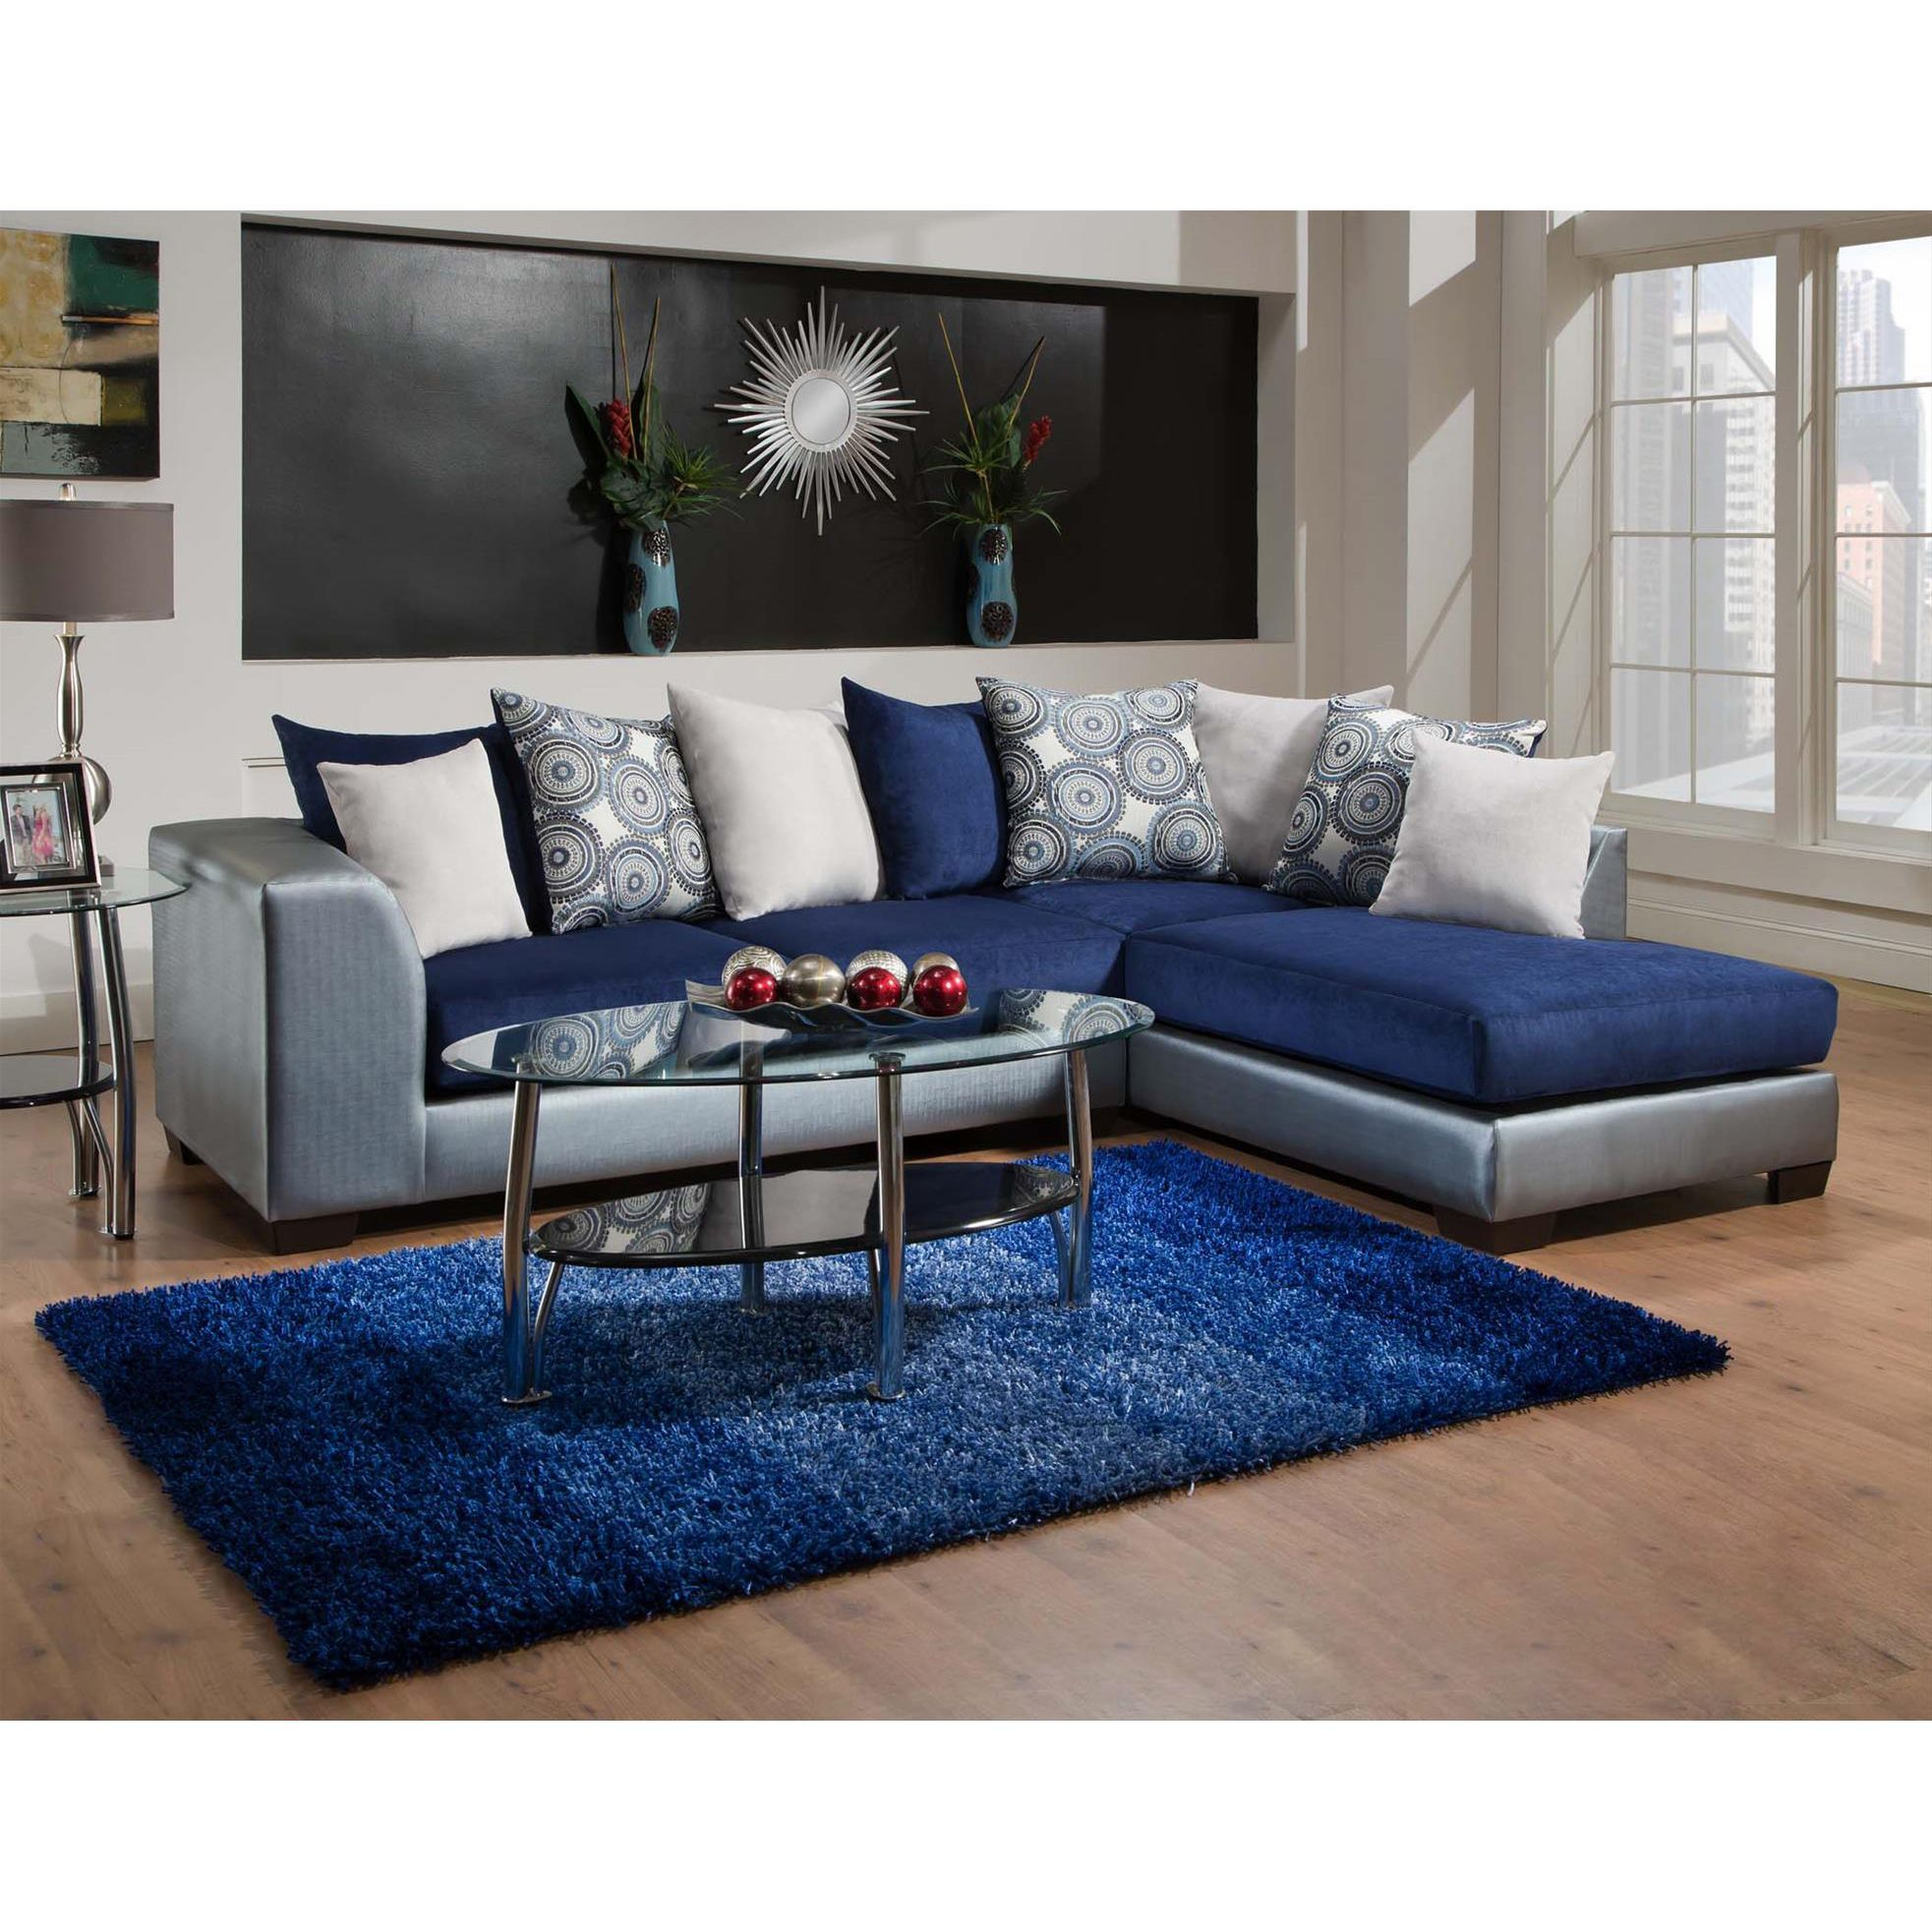 Sofa Trendz Amy Blue MicrofiberPolyurethane Sectional